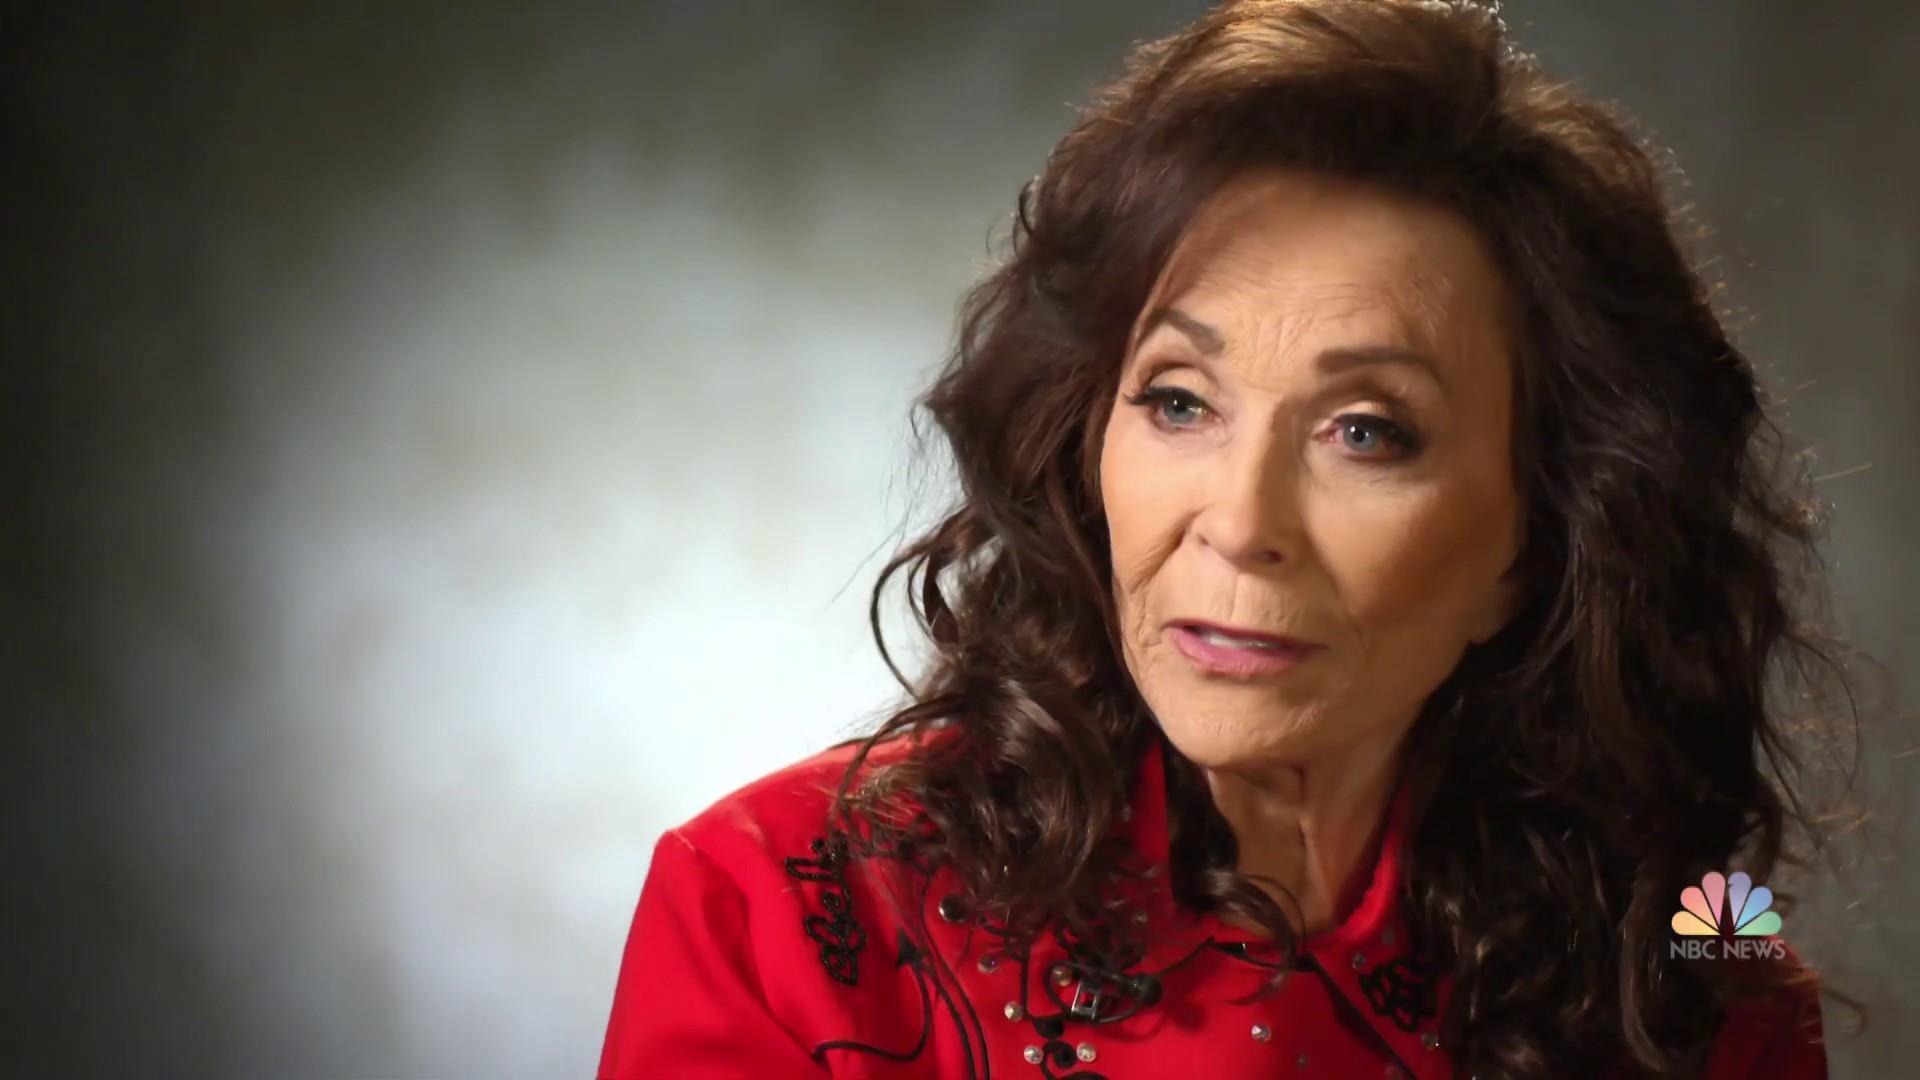 Celebrating the Coal Miner's Daughter: Country music legend Loretta Lynn turns 87